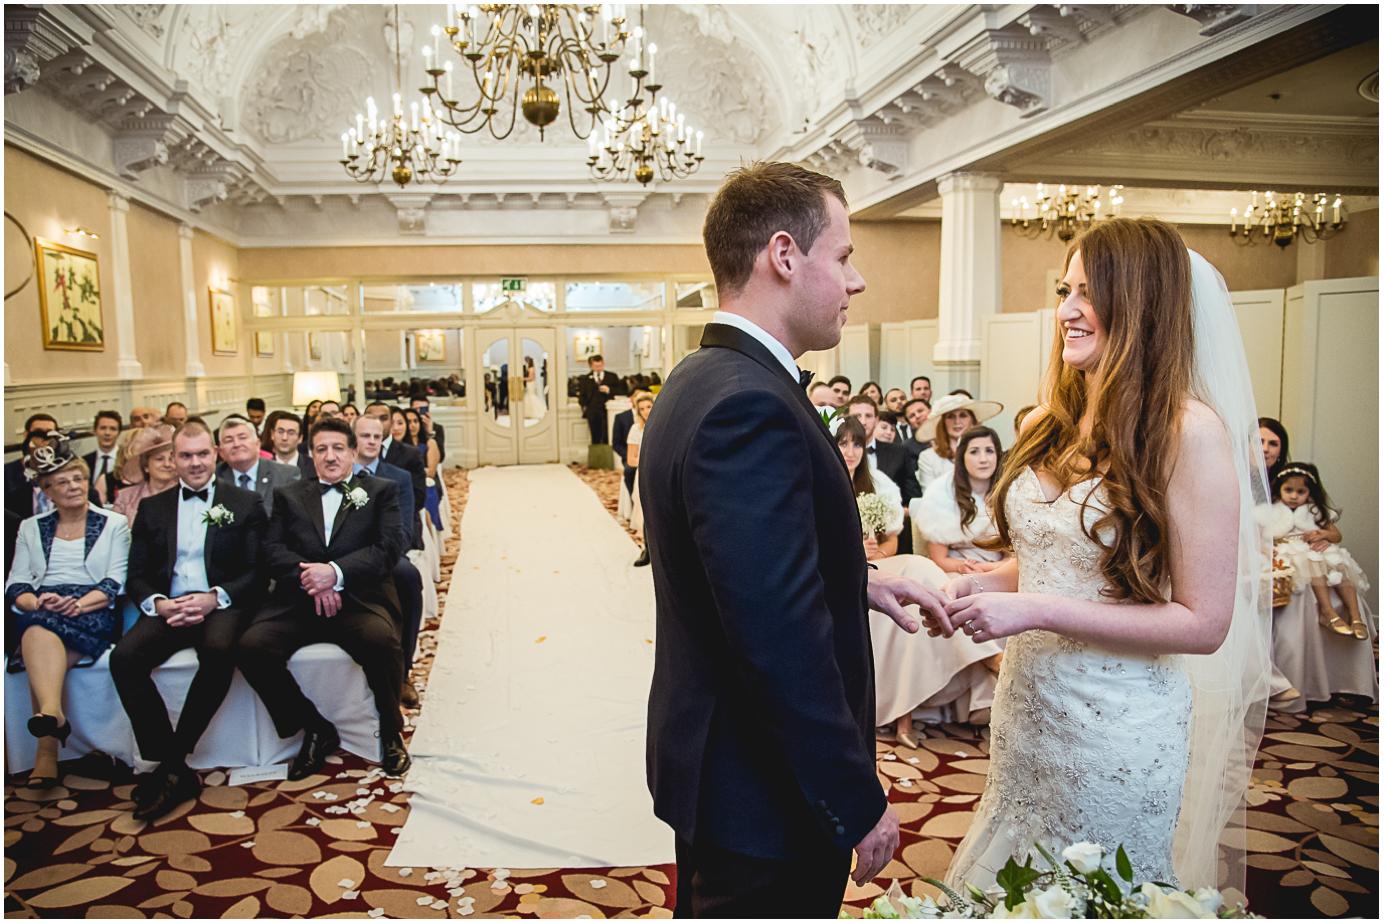 35 - Esmat and Angus - St. Ermin's Hotel London wedding photographer